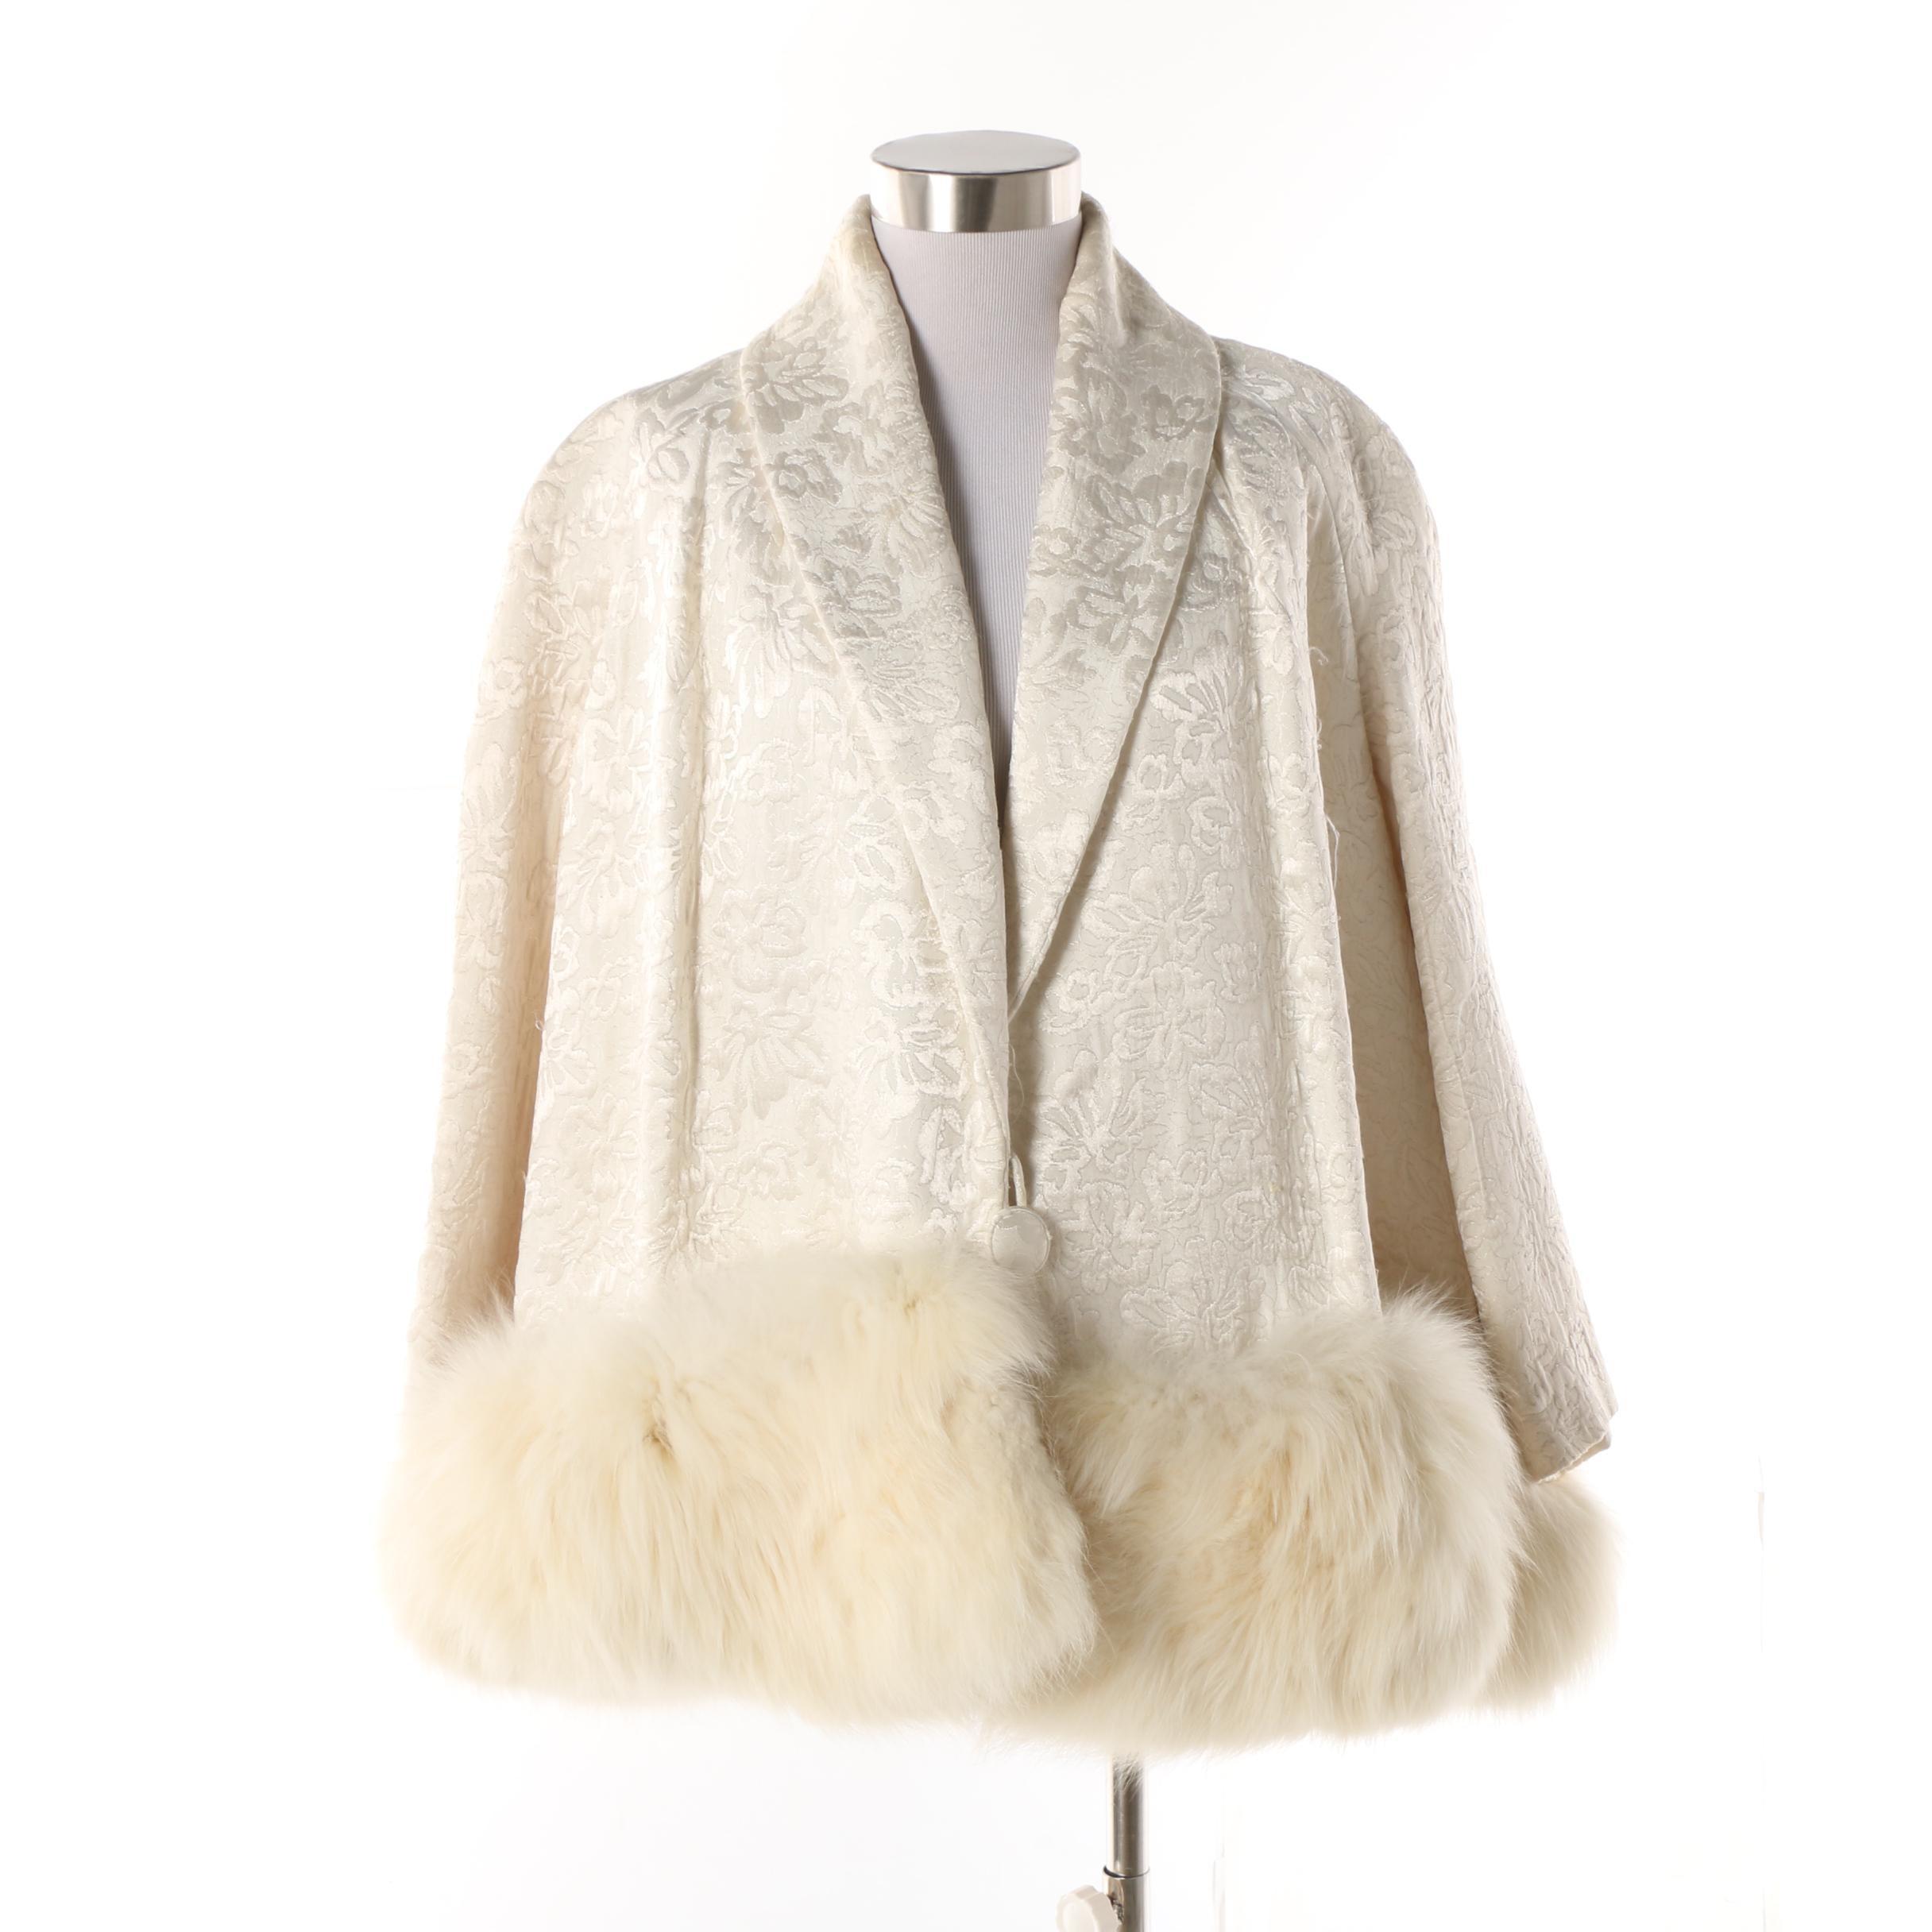 Vintage Brocade Swing Jacket with Arctic Fox Fur Trim